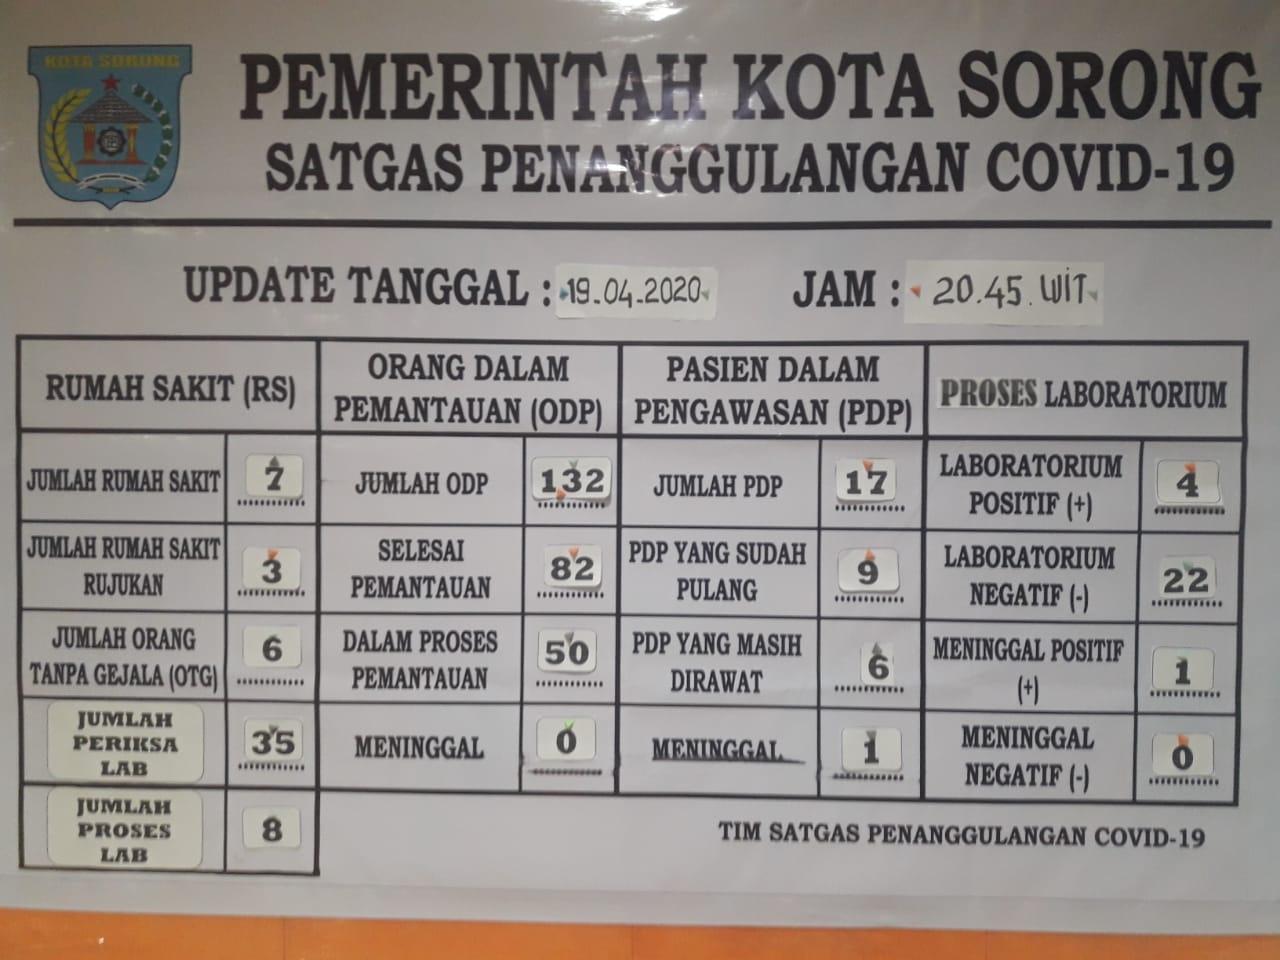 Warga Patut Waspada, Kota Sorong Jadi Transmisi Lokal Covid-19 1 IMG 20200420 WA0005 1